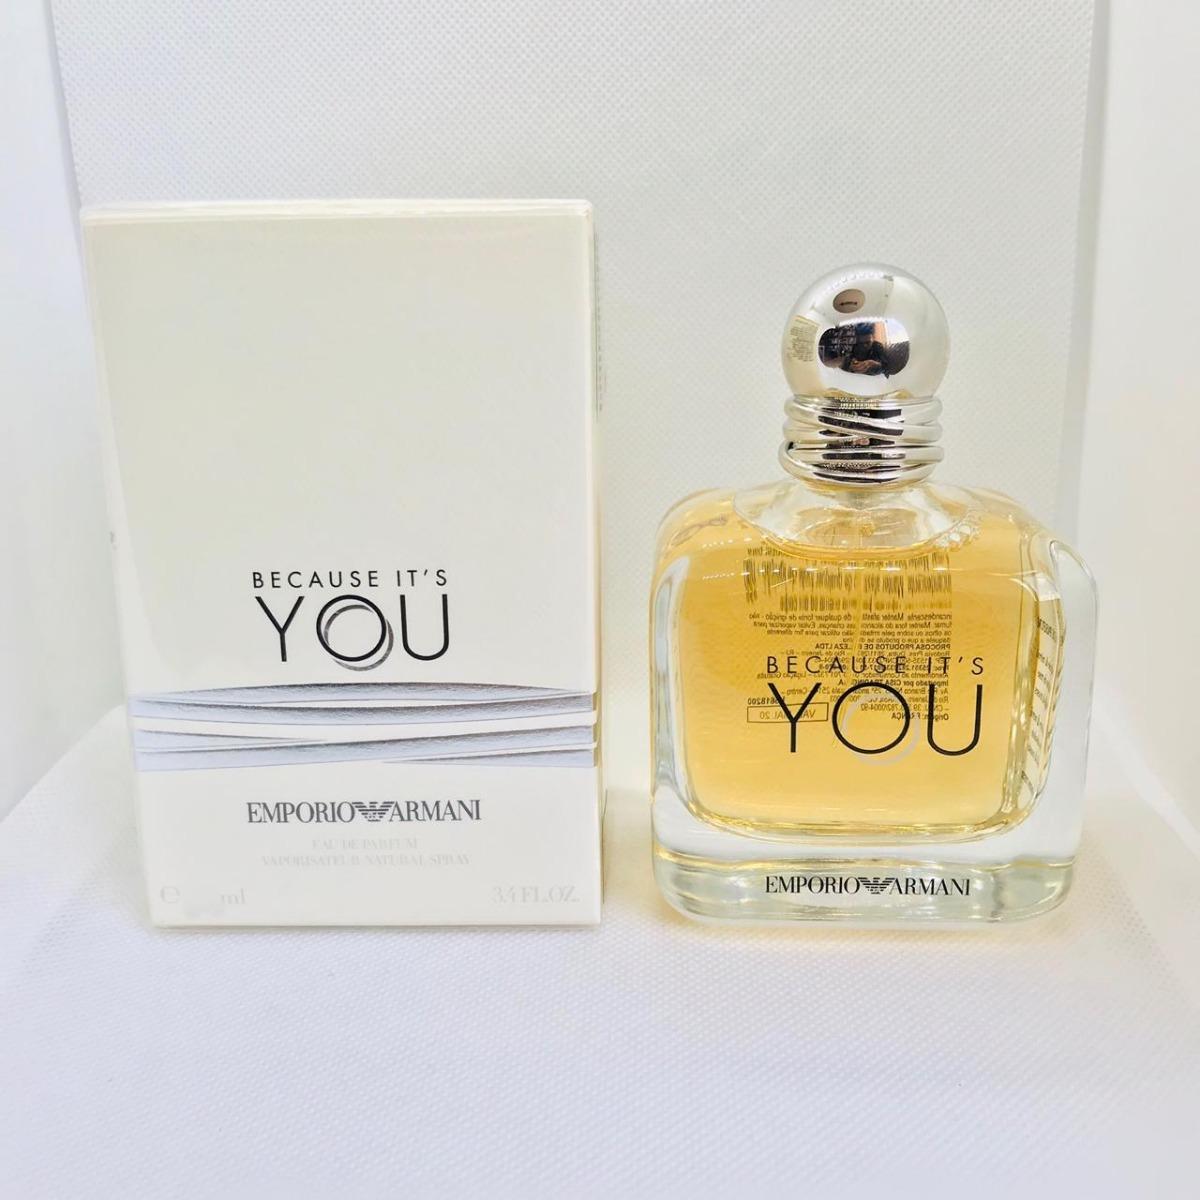 7649aa00f7 because it's you emporio armani femino eau de parfum 30ml. Carregando zoom.